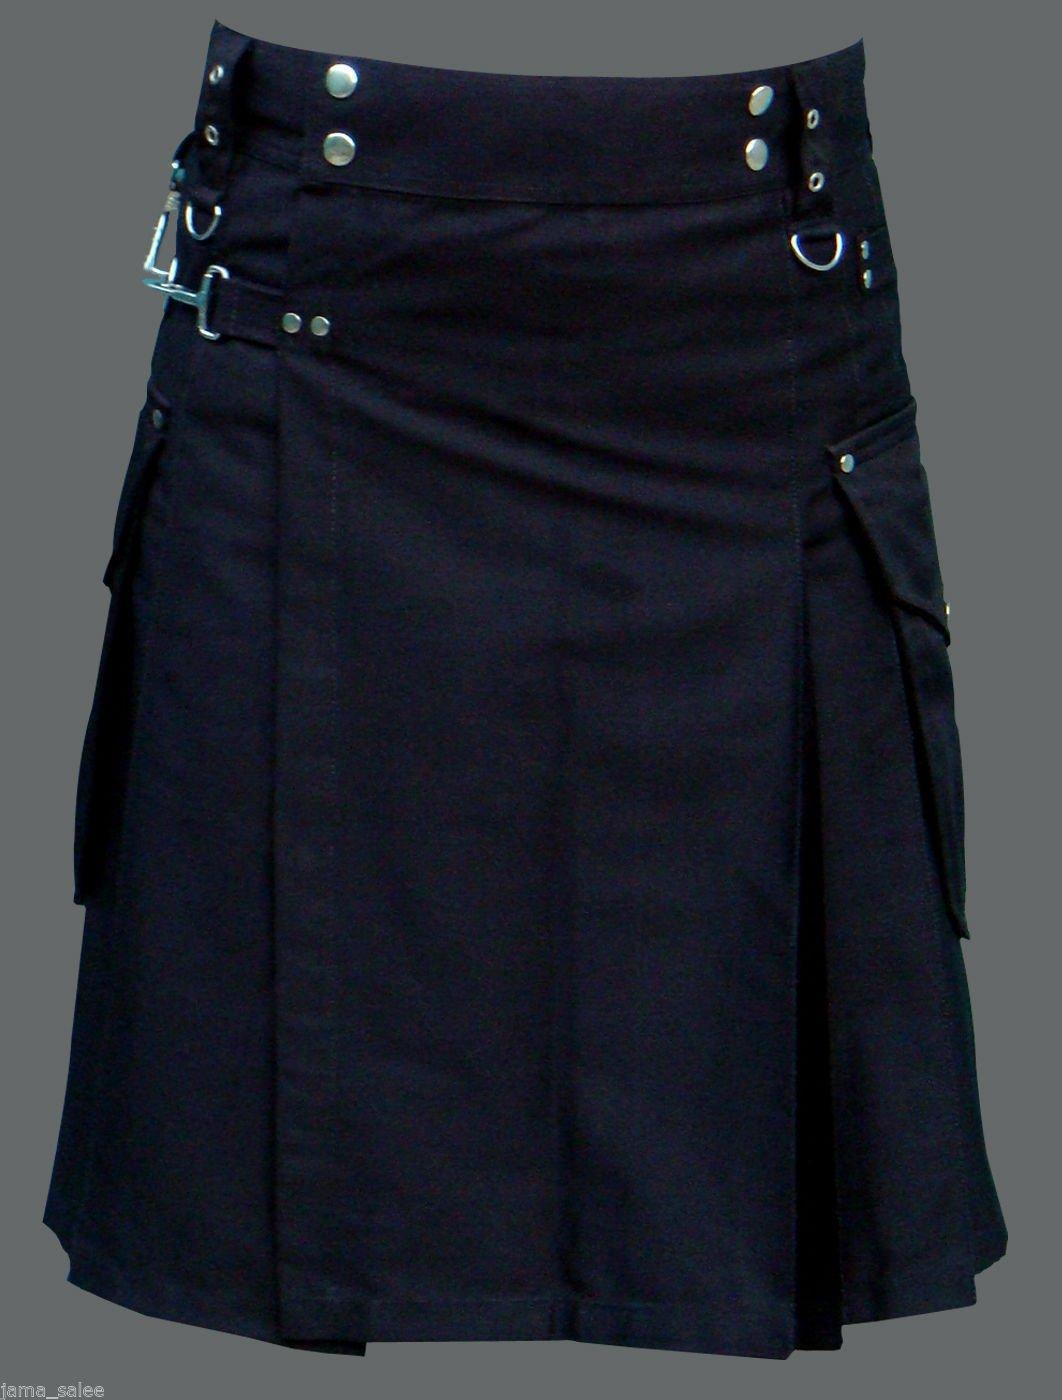 Deluxe Black Cotton Kilt Handmade Utility Gothic Modern Kilt with Cargo Pockets Waist Size 36 to Fit